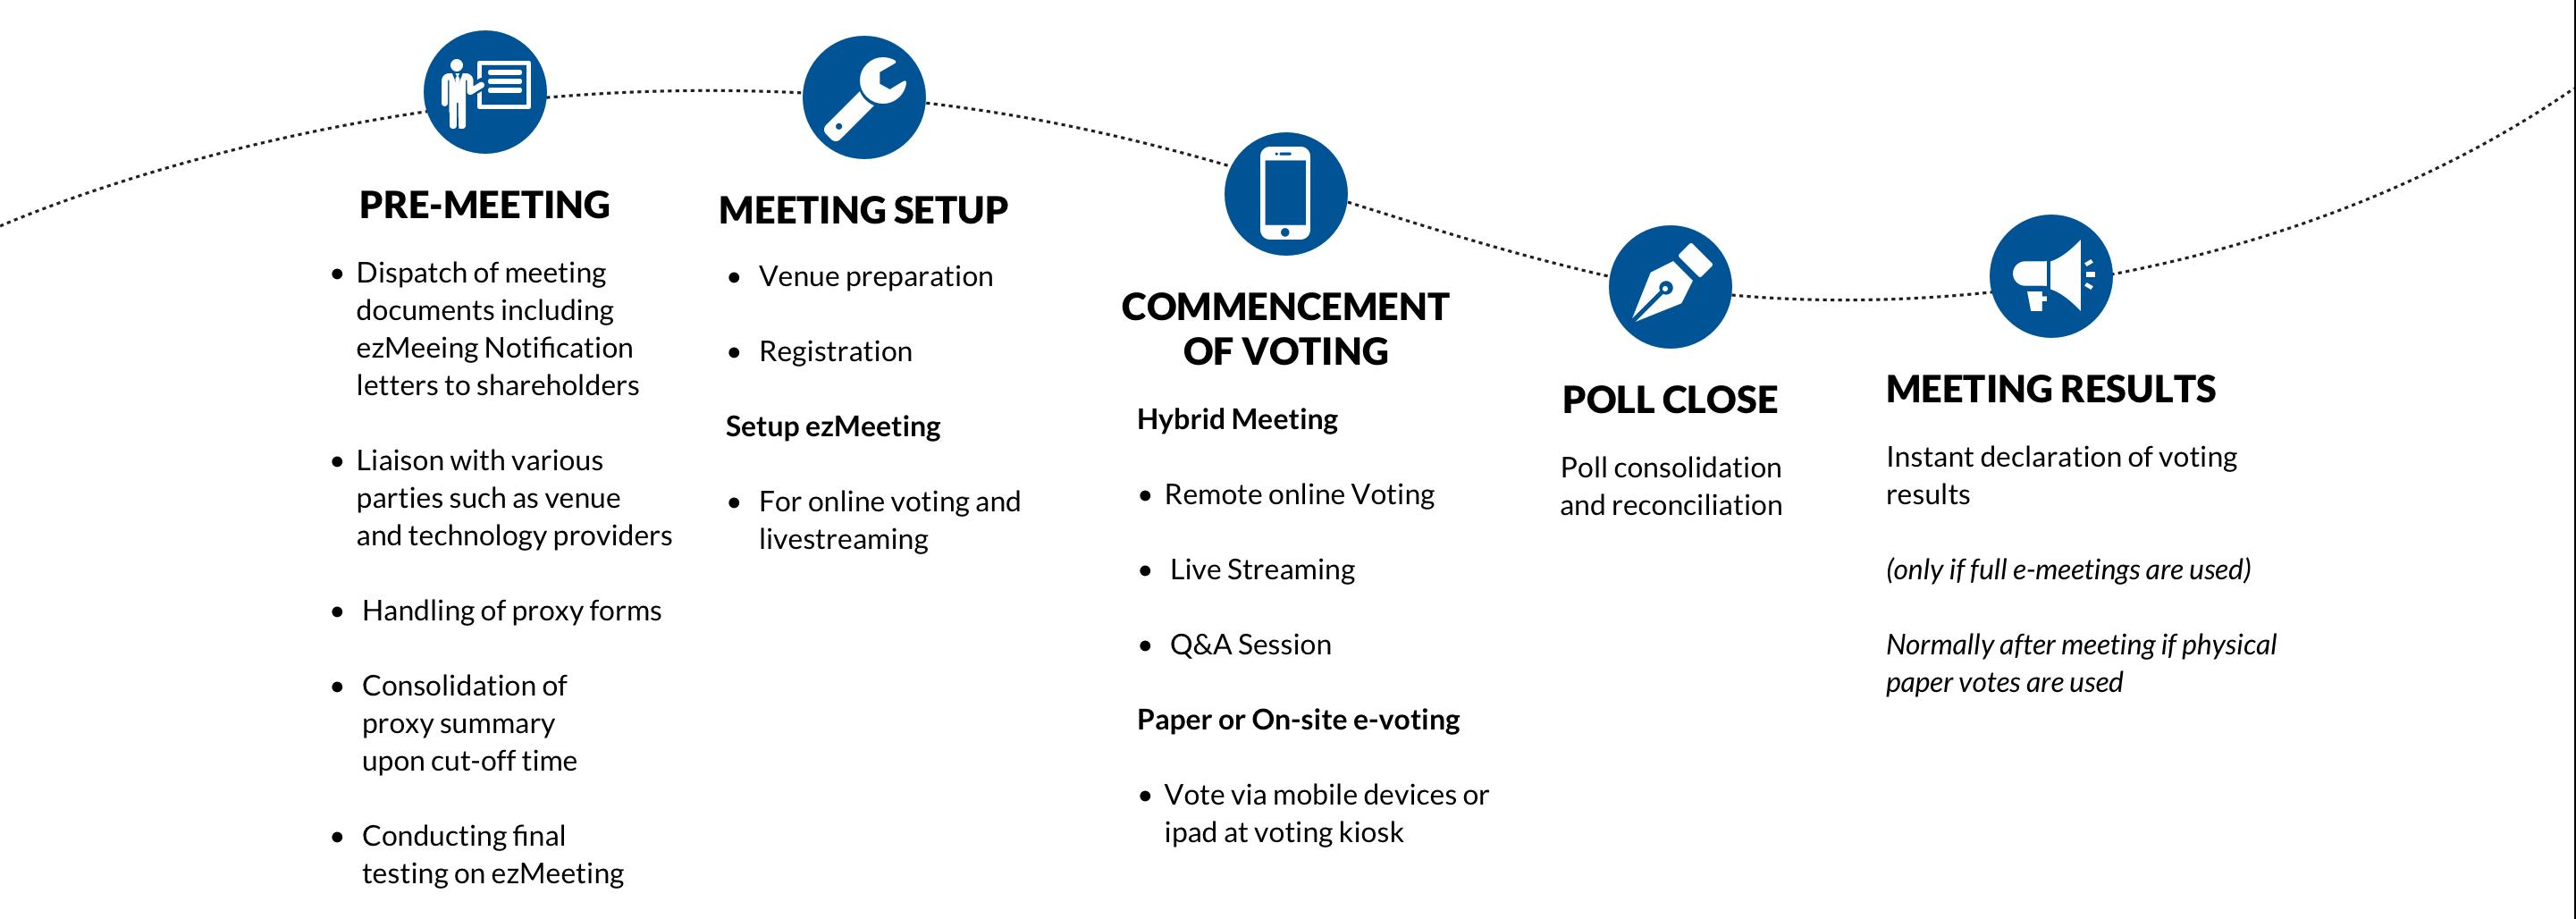 HybridMeetingSnapshot_Web-1